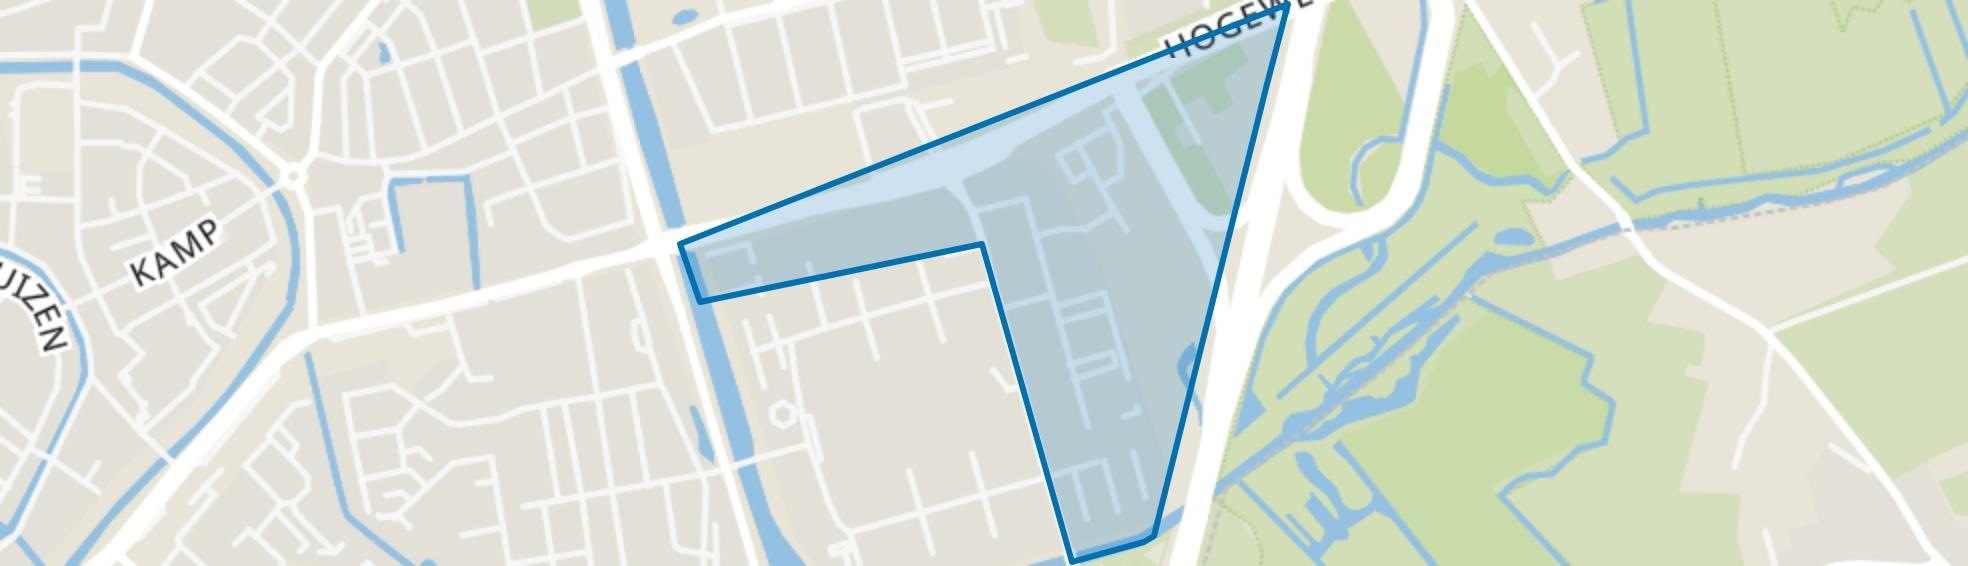 Ariaweg, Amersfoort map